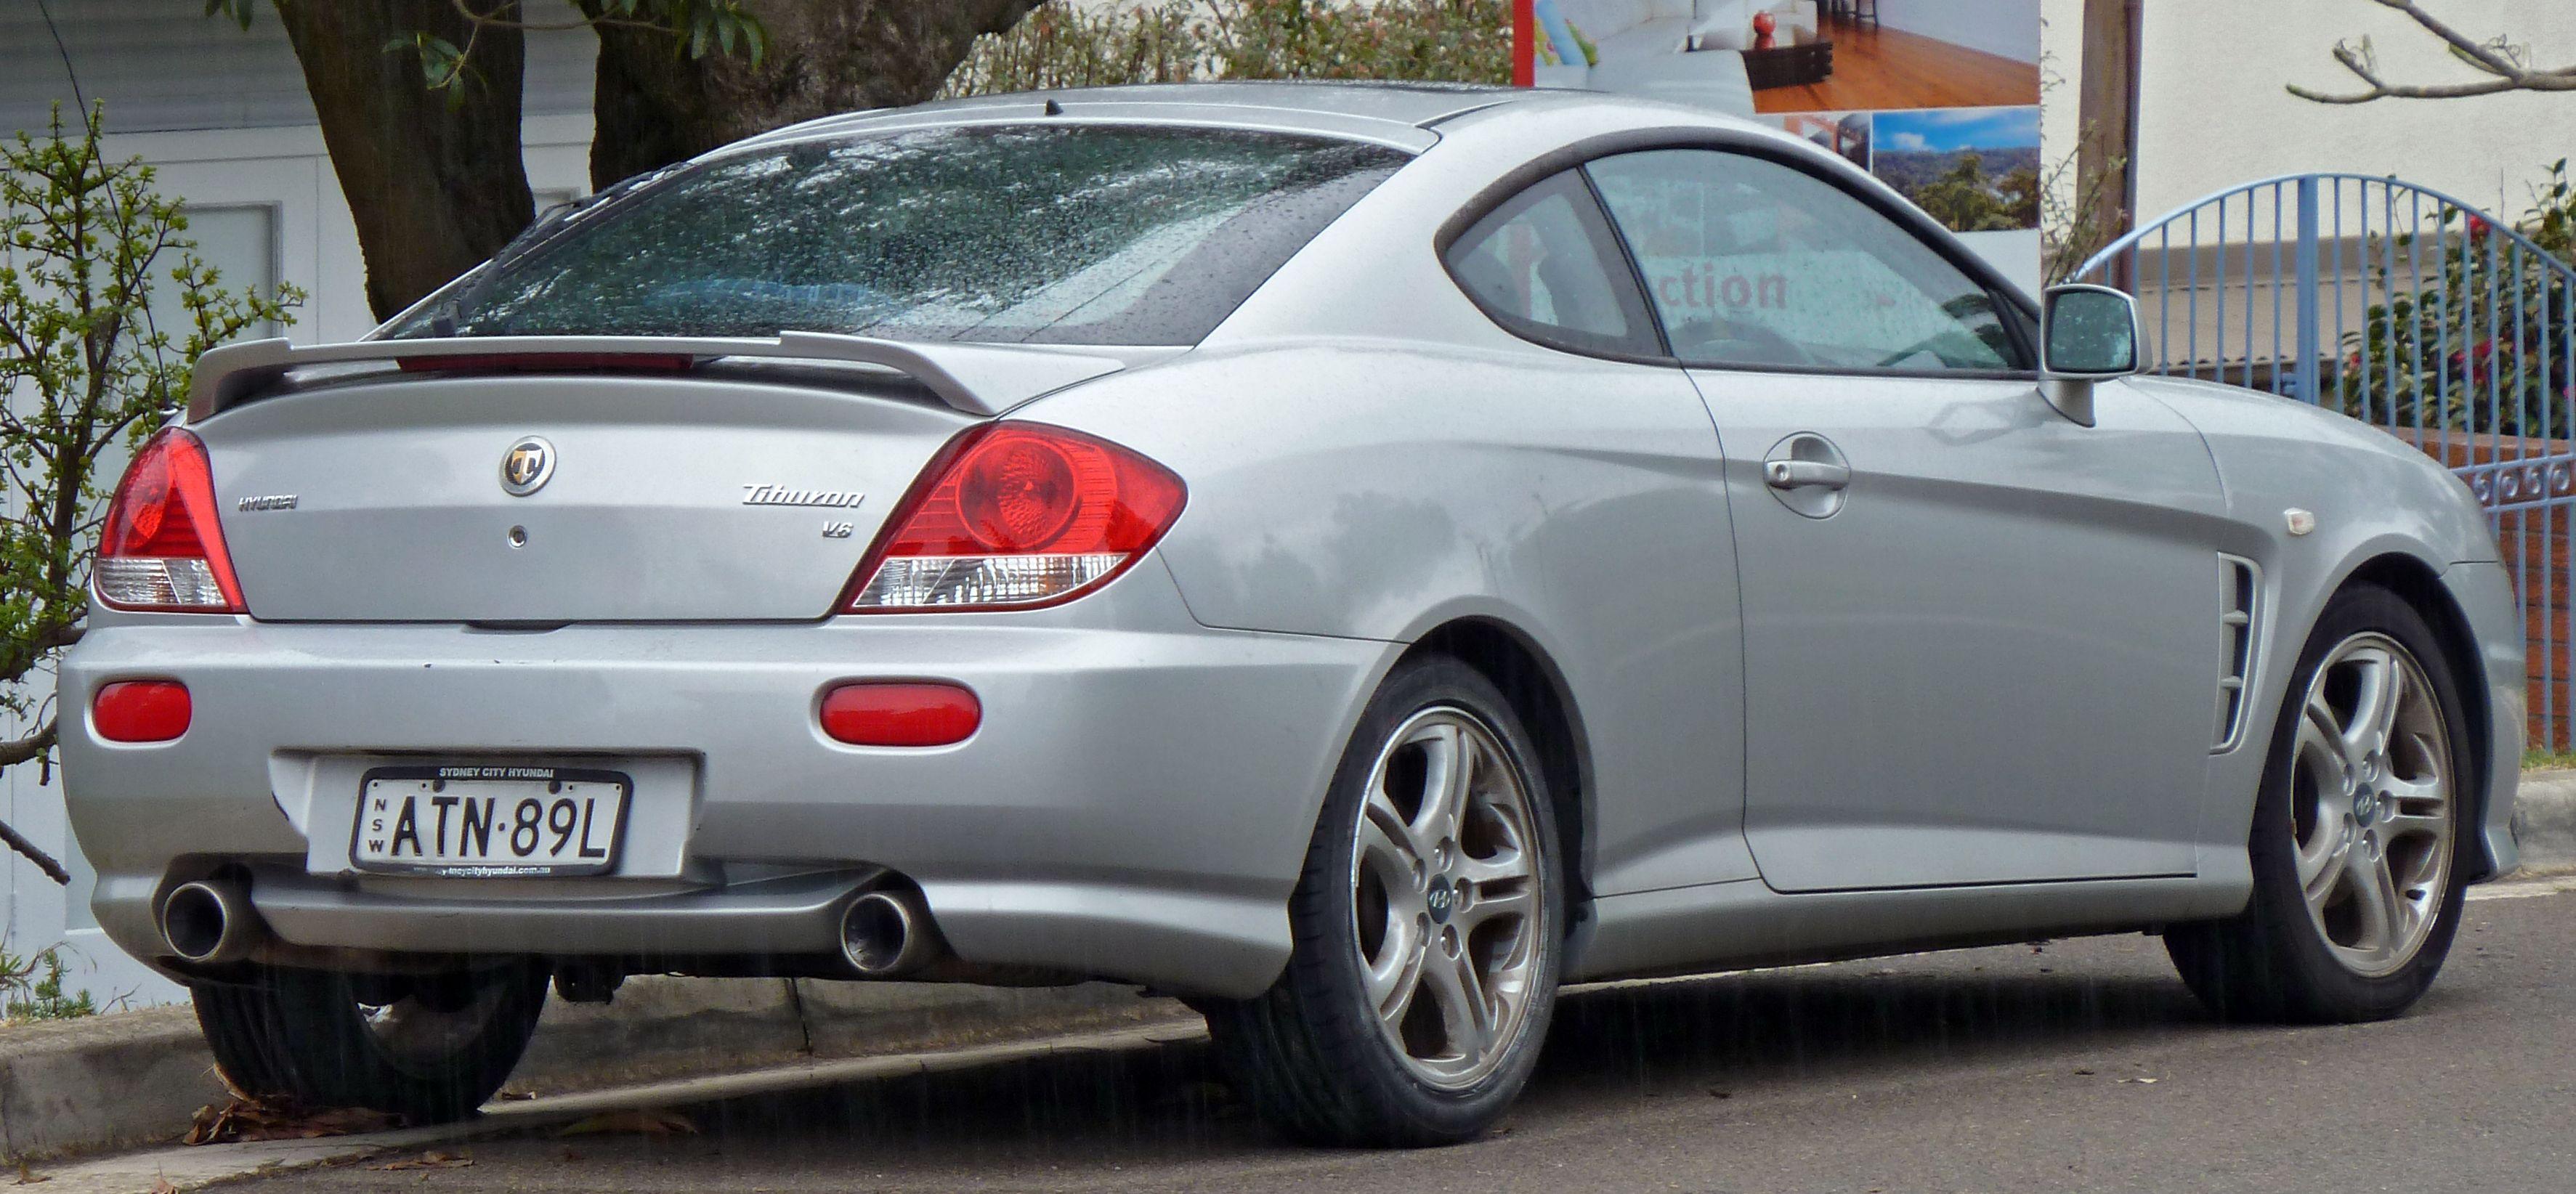 2001 hyundai tiburon with ground effects drive it like u stole it pinterest hyundai tiburon cars and coupe